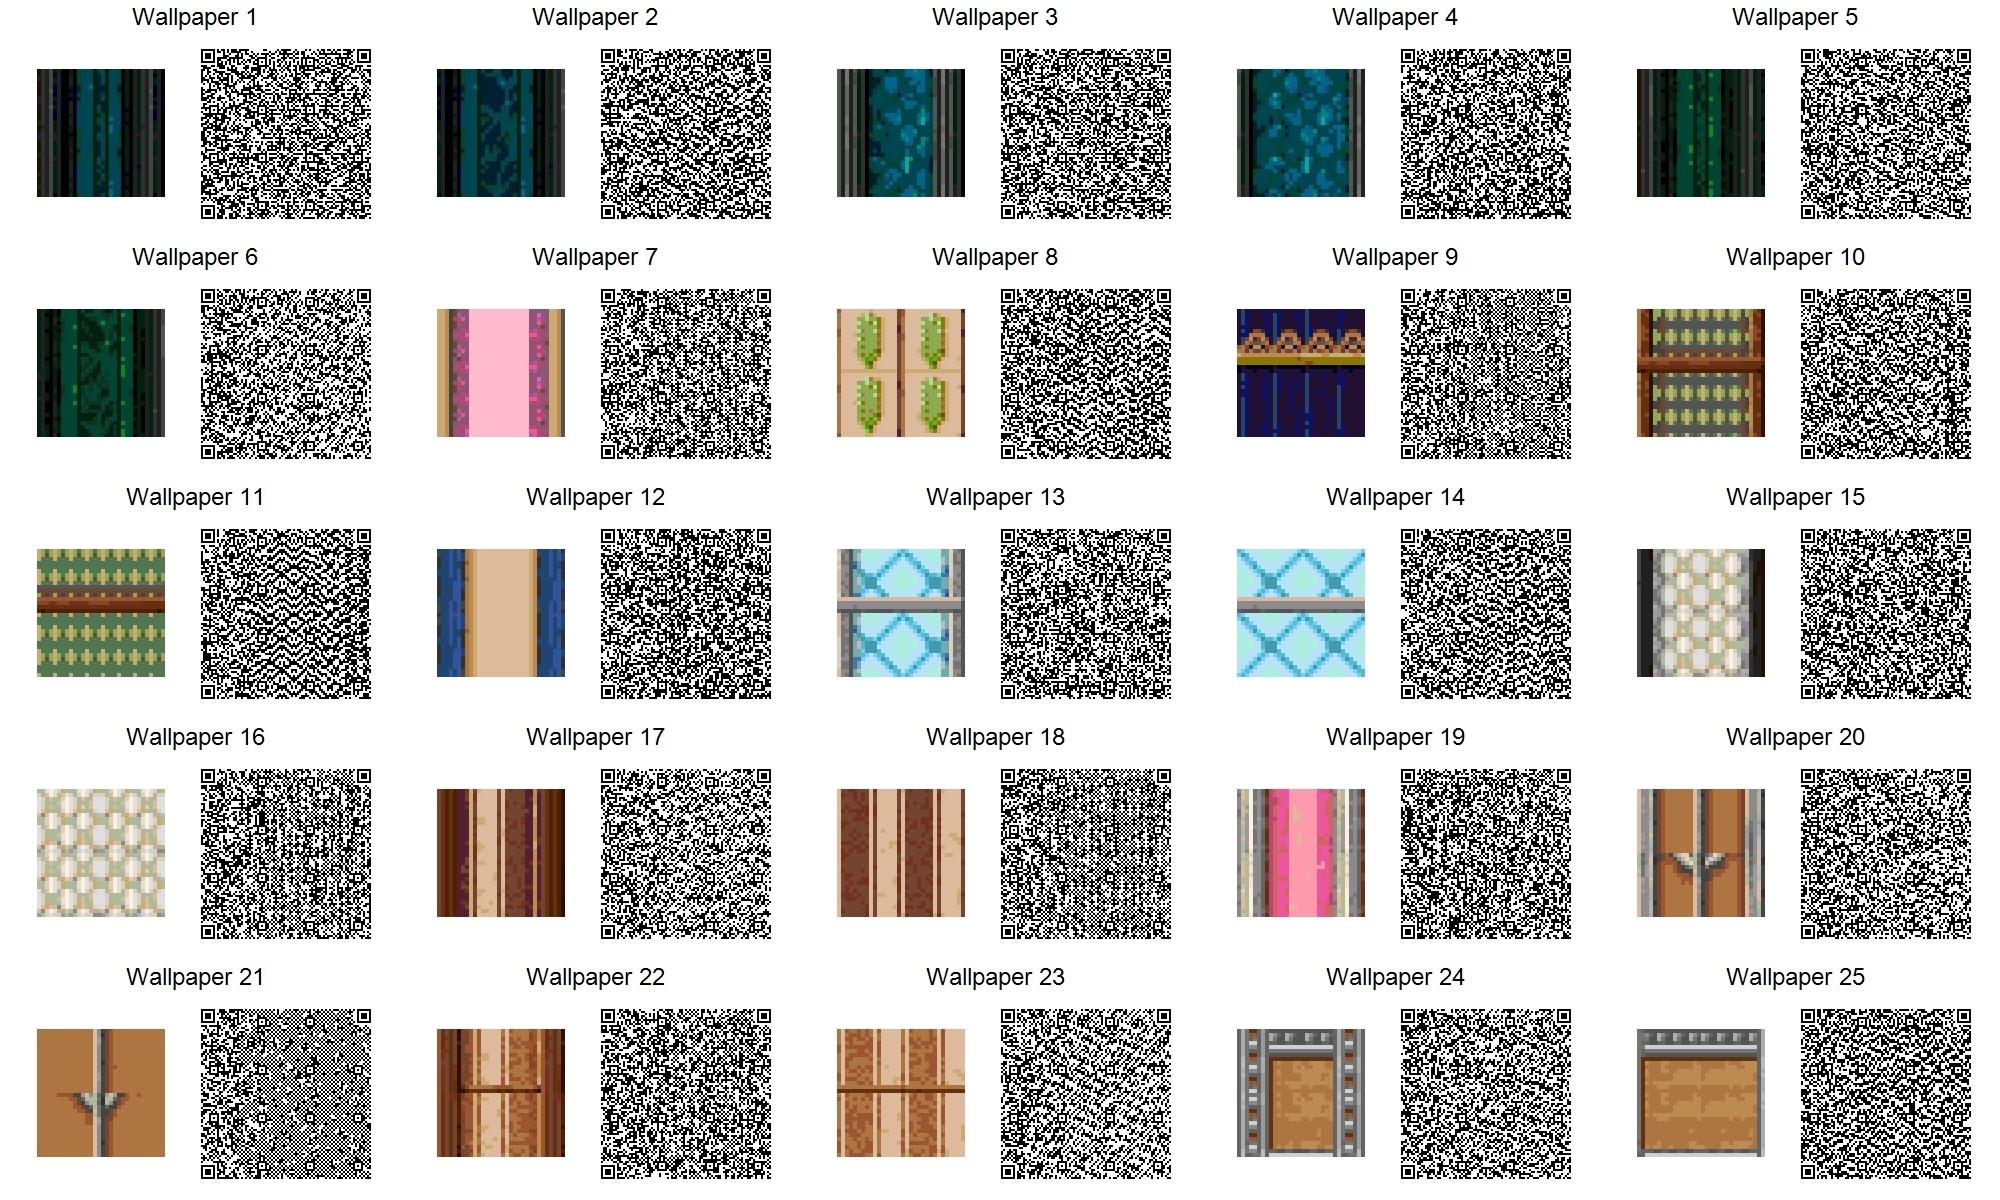 Res: 2000x1200, ACNL Wallpaper by frootzcat ACNL Wallpaper by frootzcat